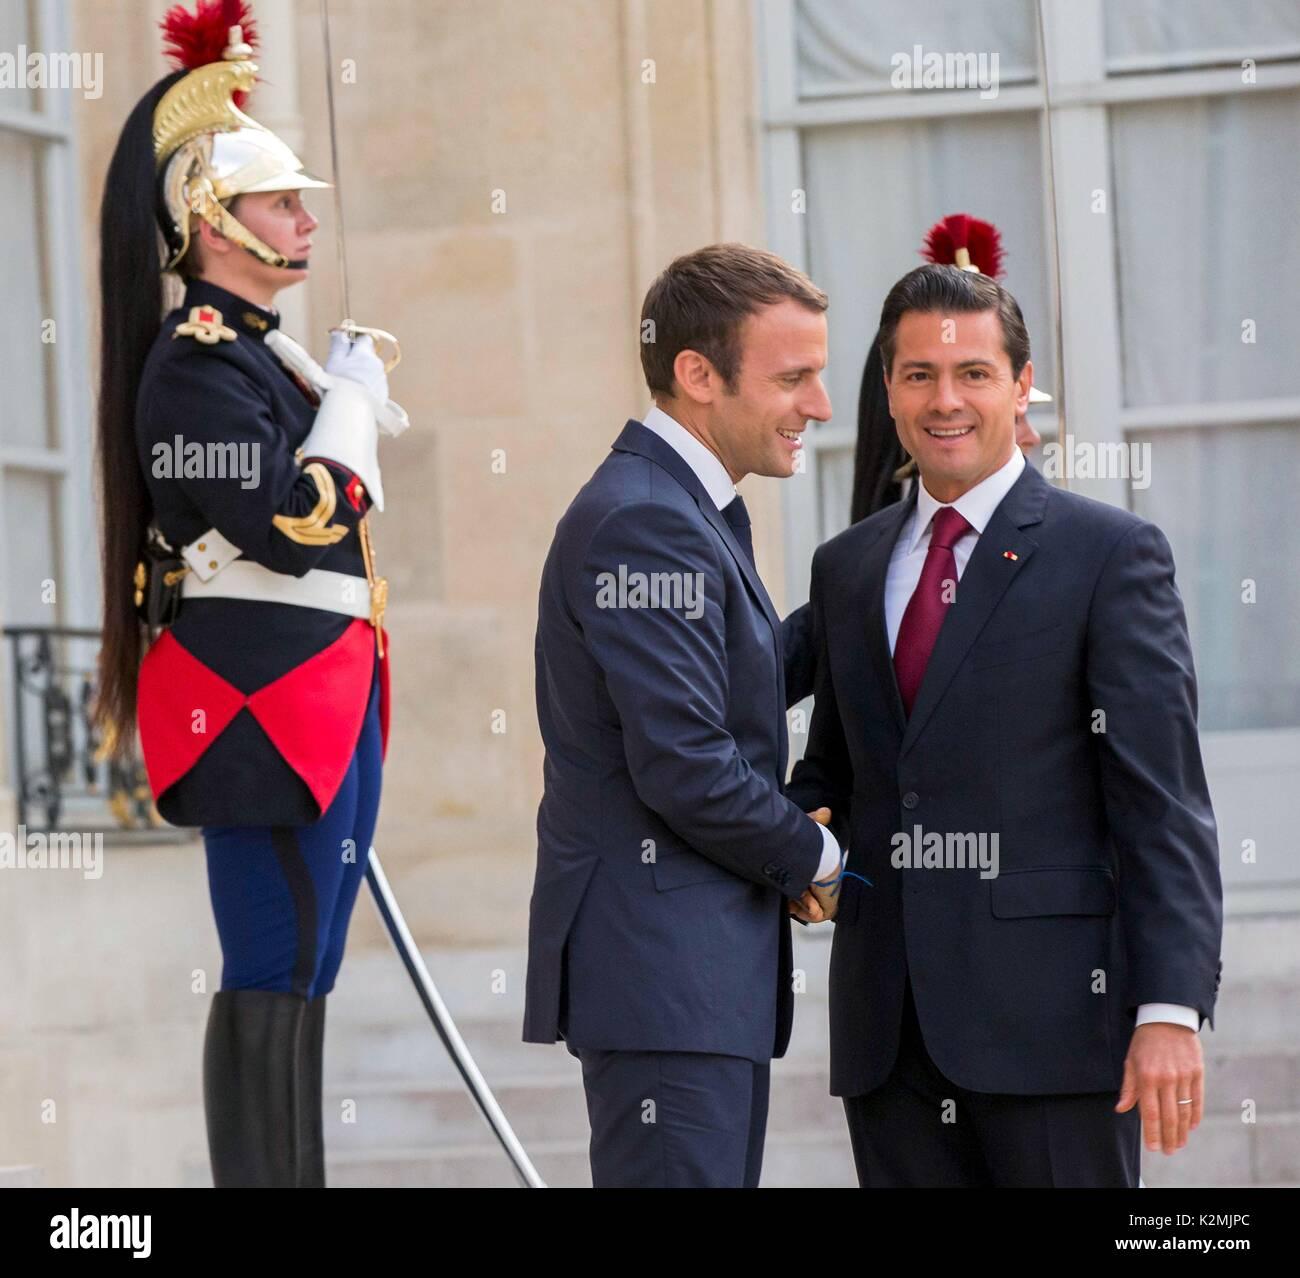 French President Emmanuel Macron Welcomes Mexican President Enrique Pena  Nieto 8fc52ad300b